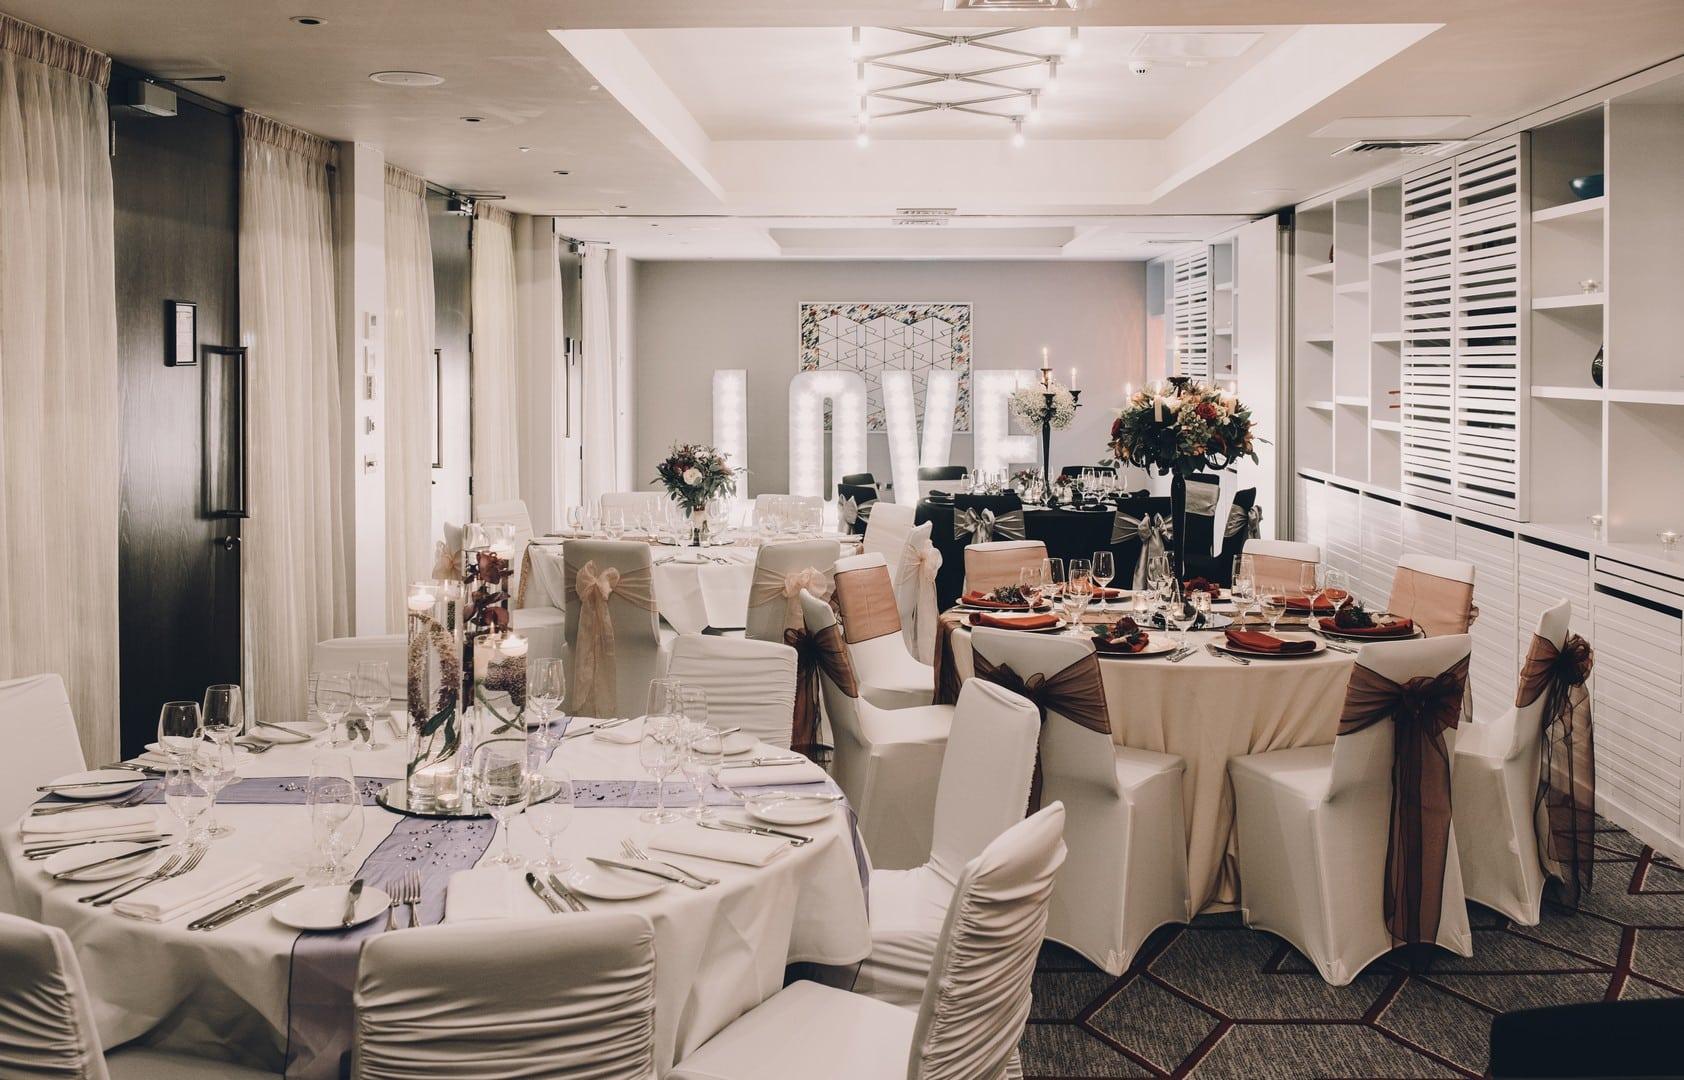 glasgow-malmaison-scottish-wedding-venue-city-centre-boutique-hotel-packages-reception-ceremony-event-dining-centrepiece-love